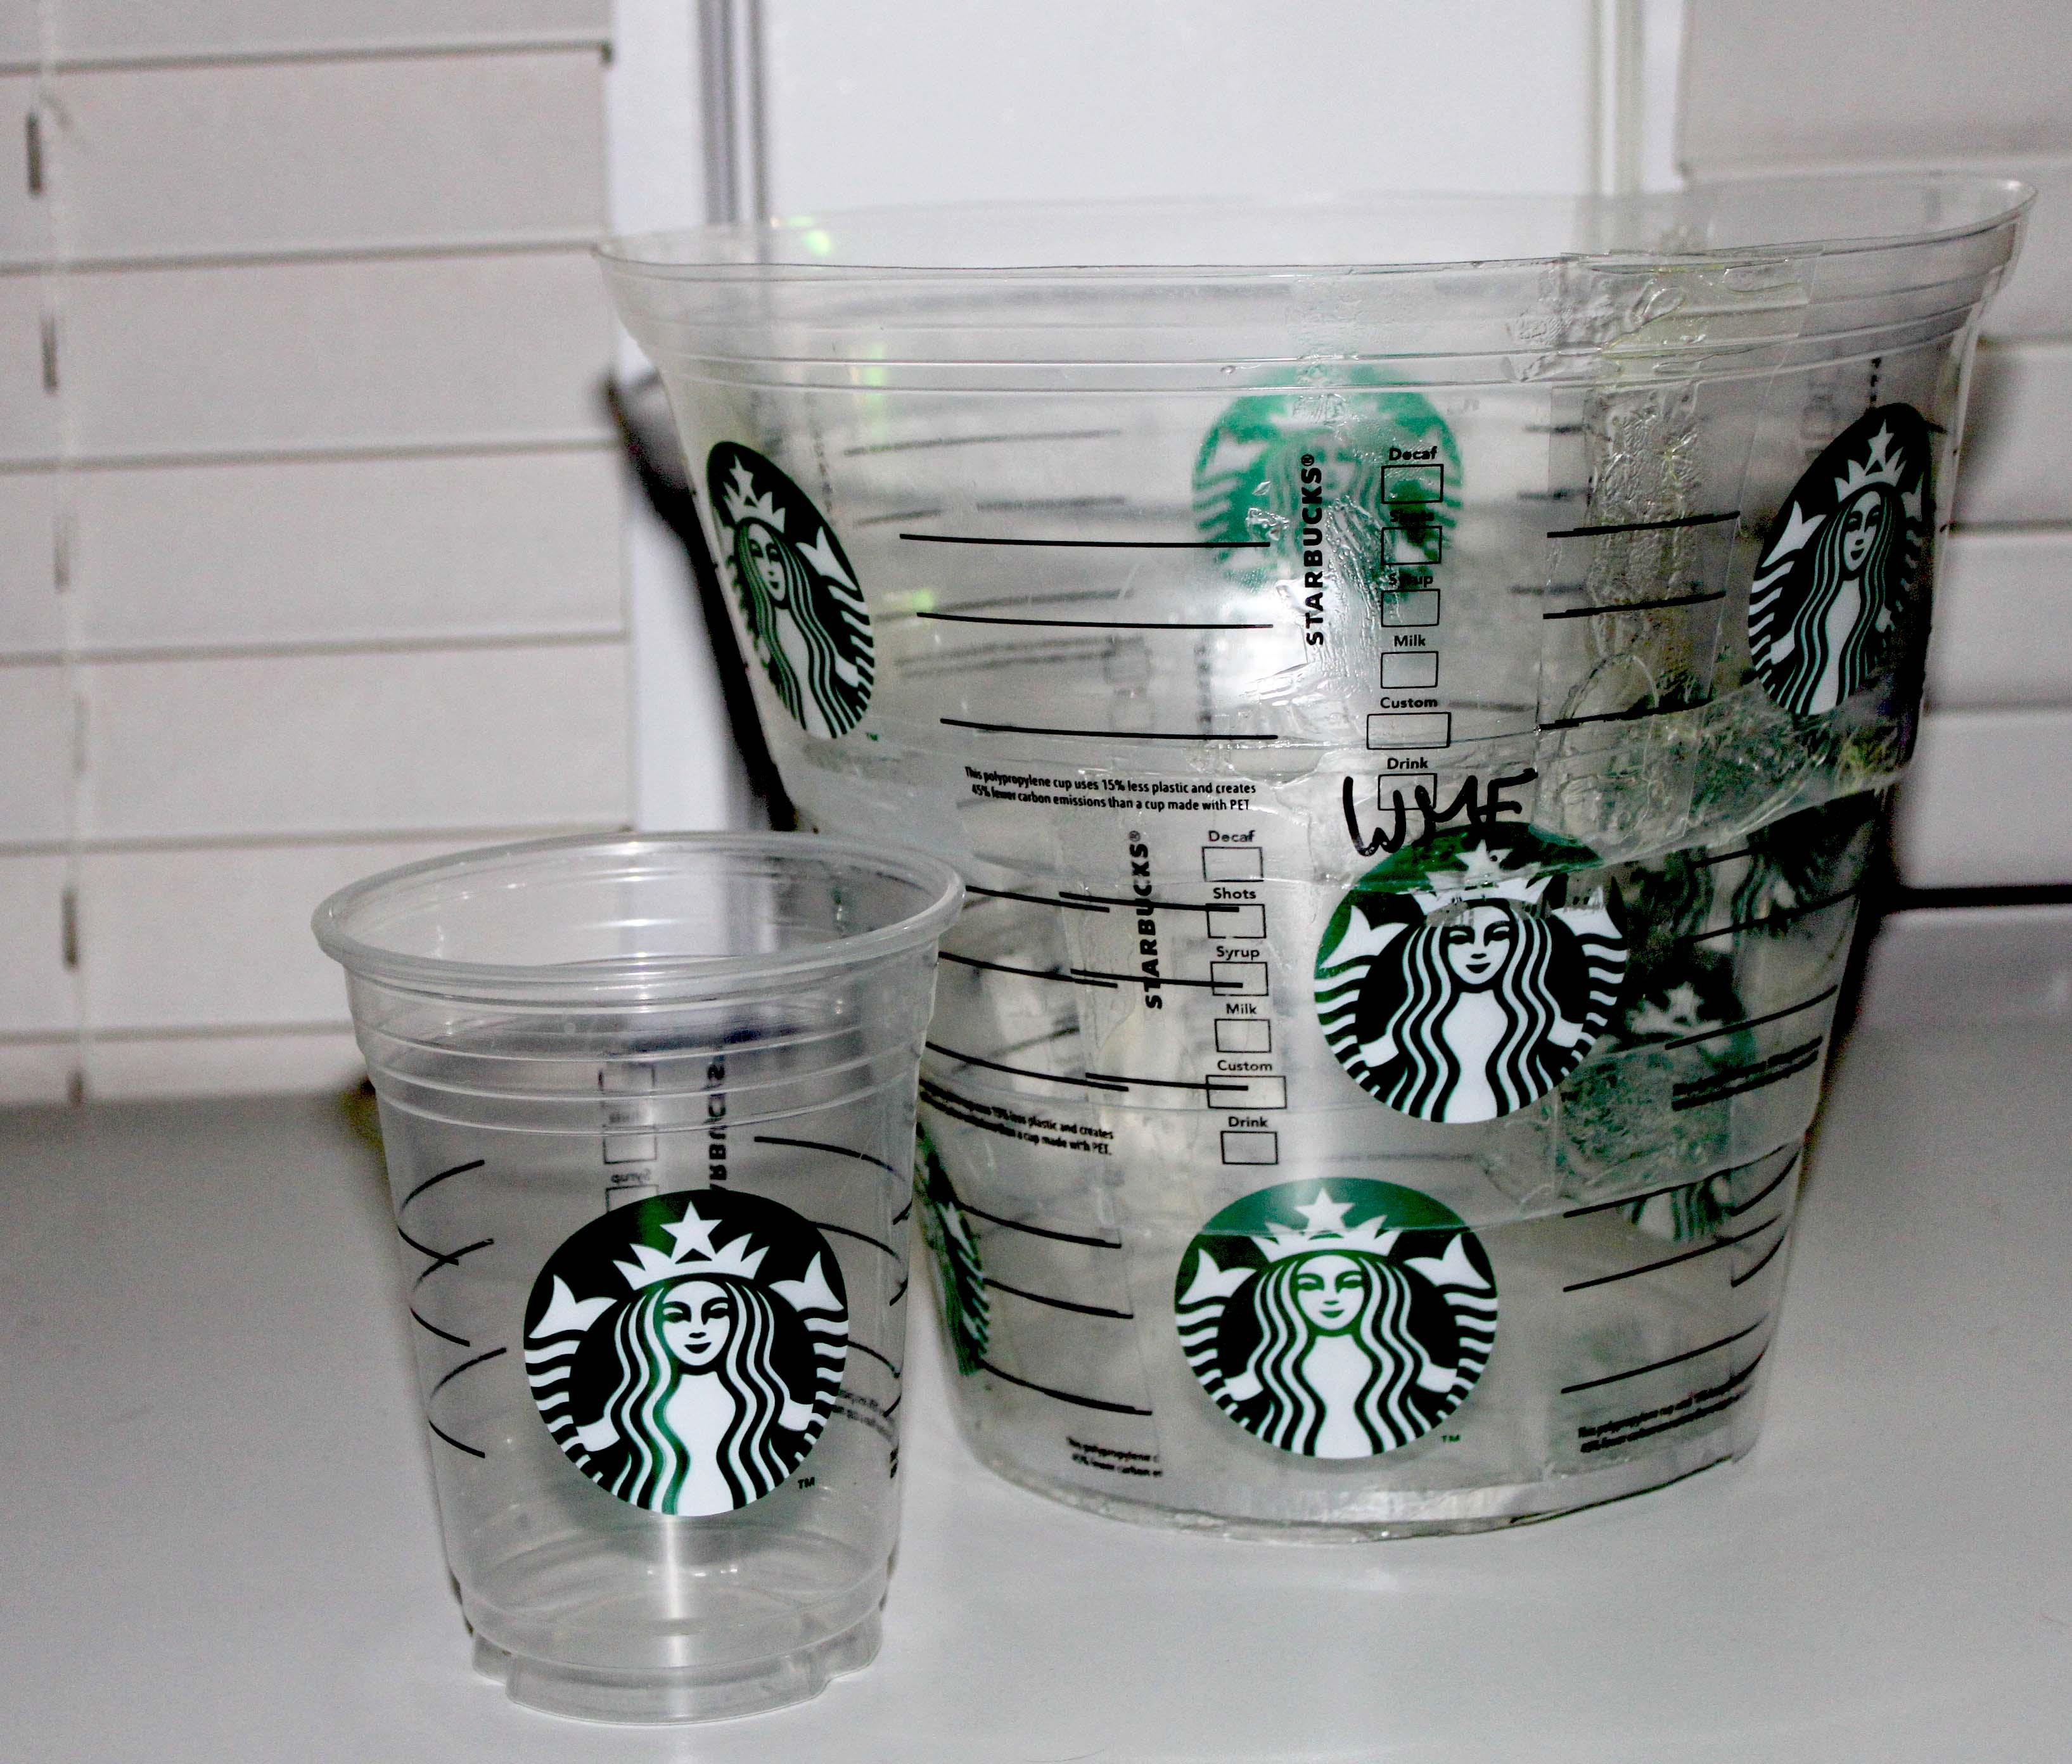 Starbucks Plastic Cup Drawing | www.imgkid.com - The Image ...